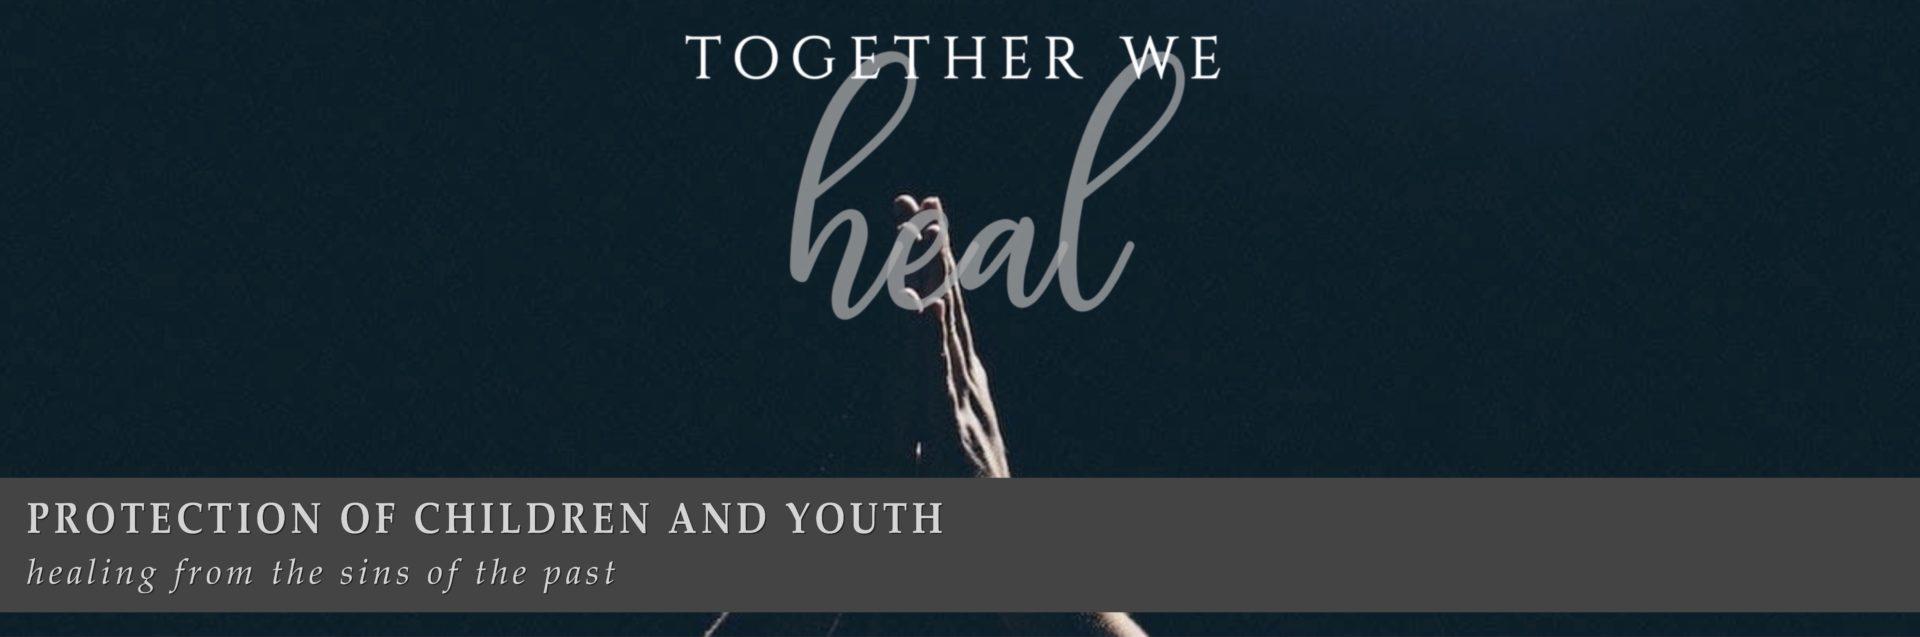 Together We Heal copy